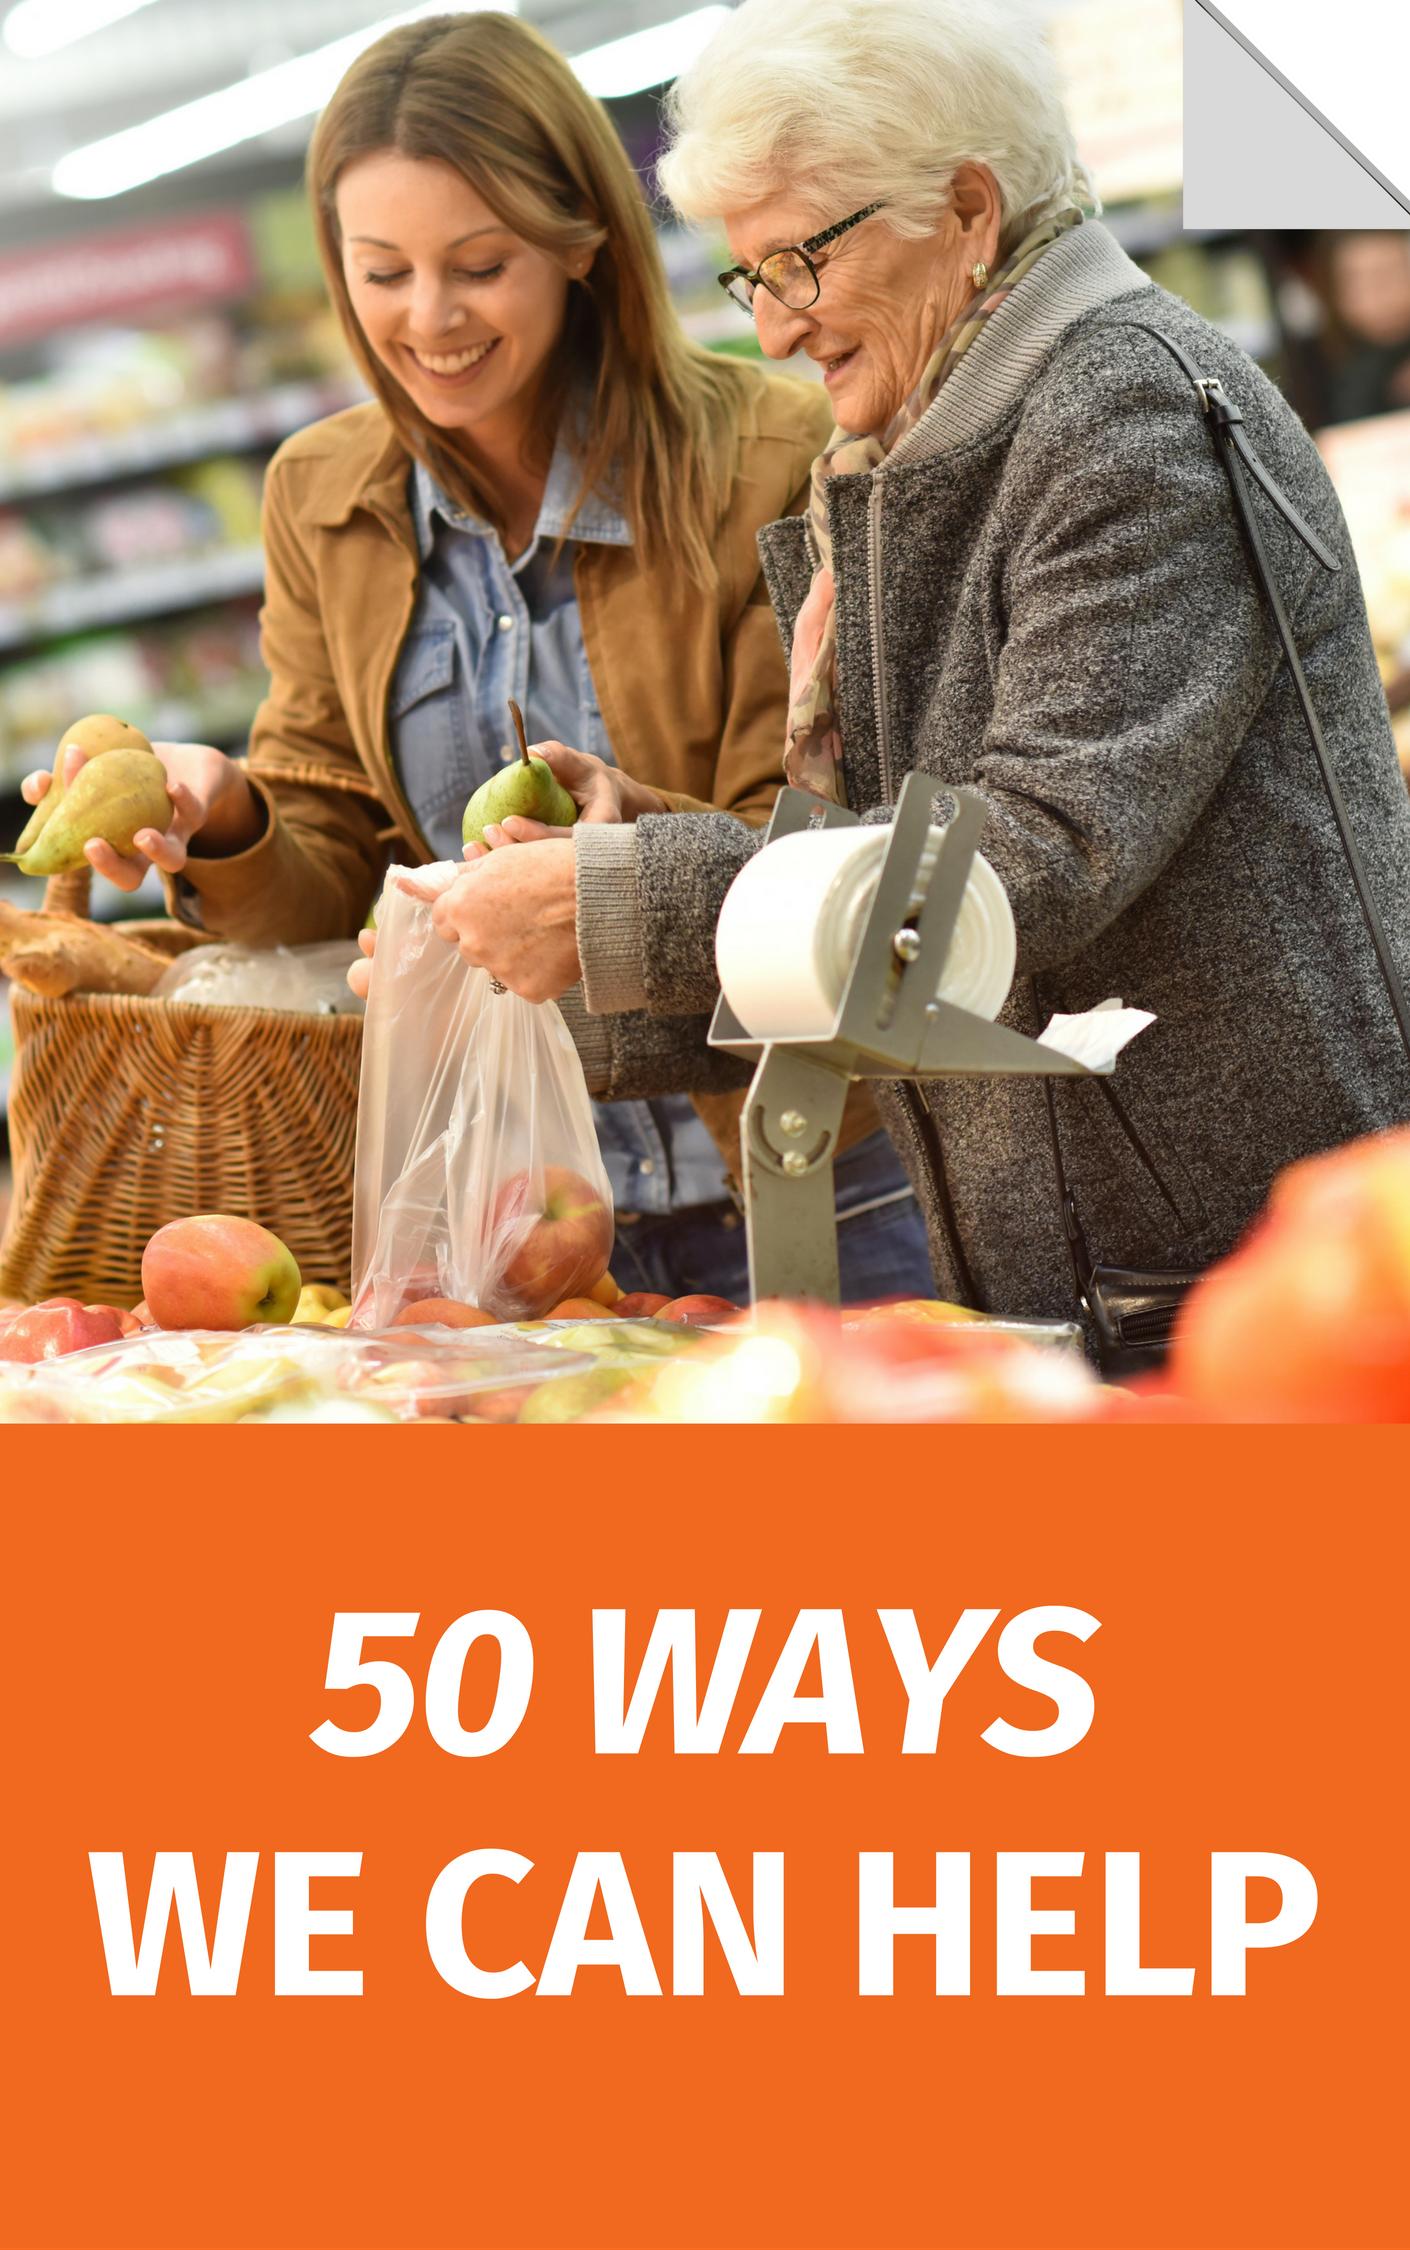 50 ways we can help